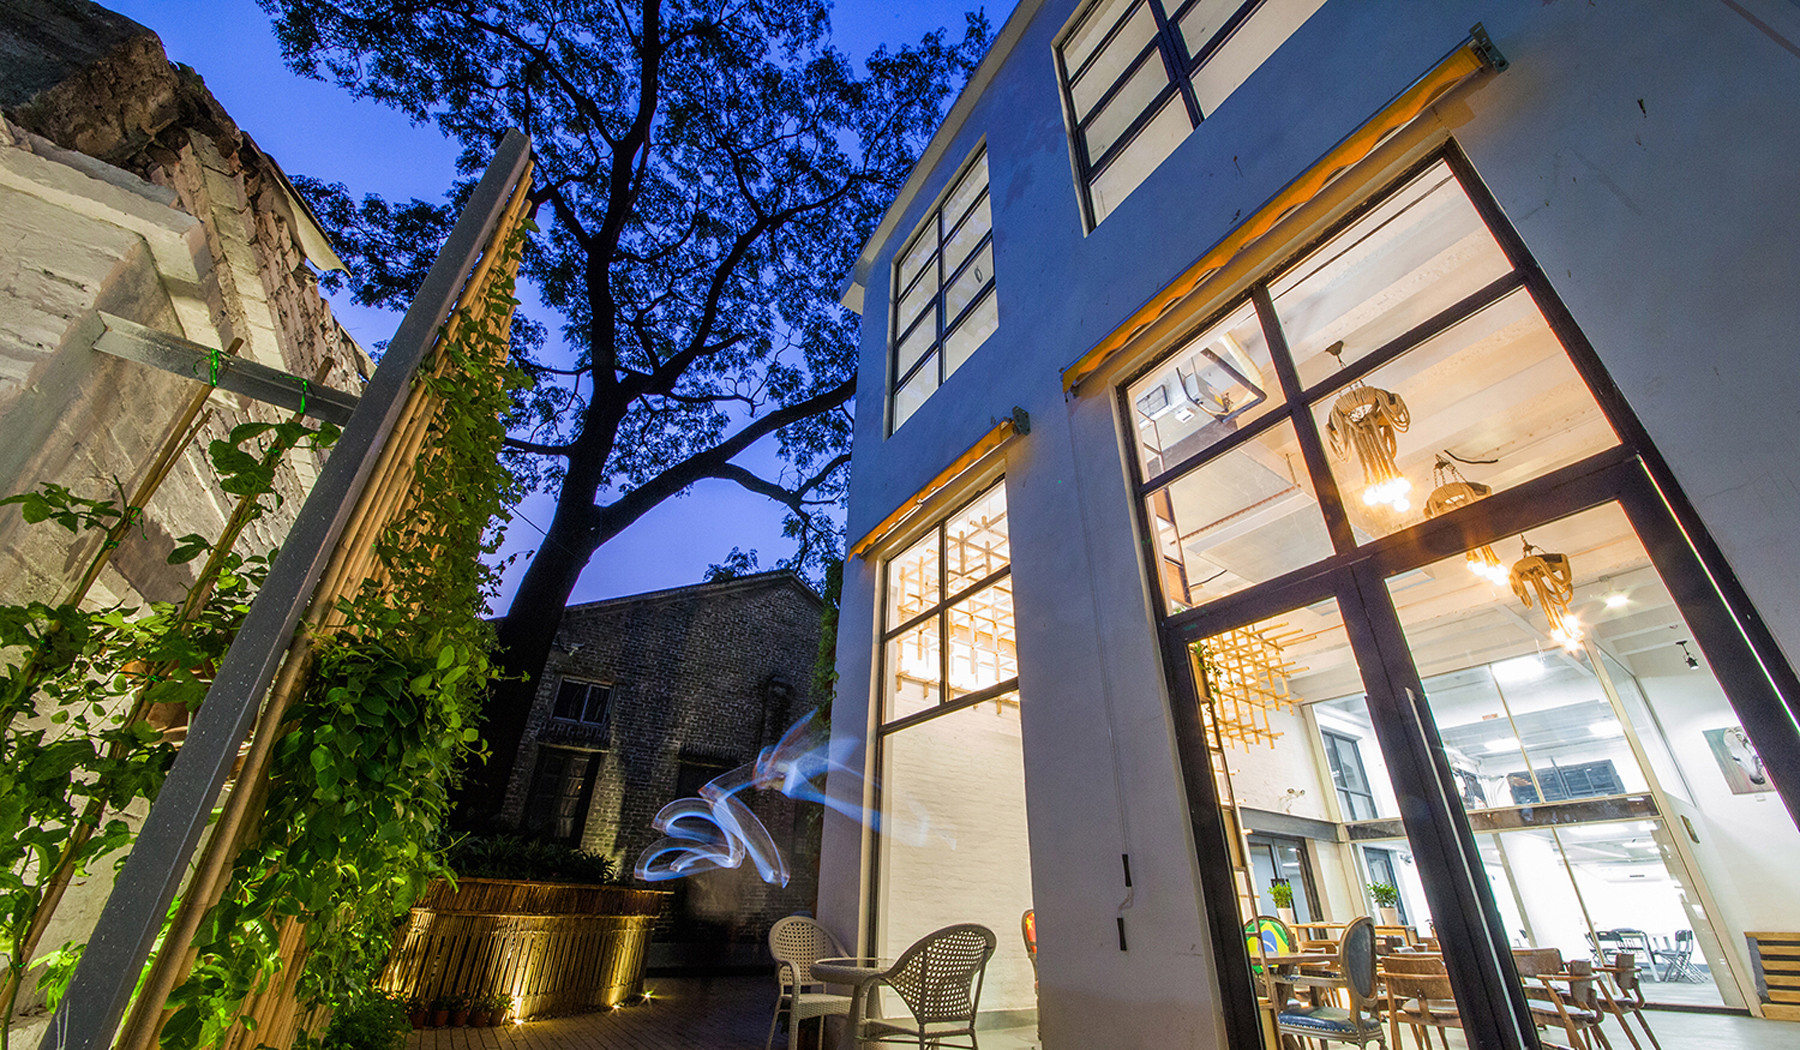 Loft风格咖啡厅装修室外篱笆墙设计